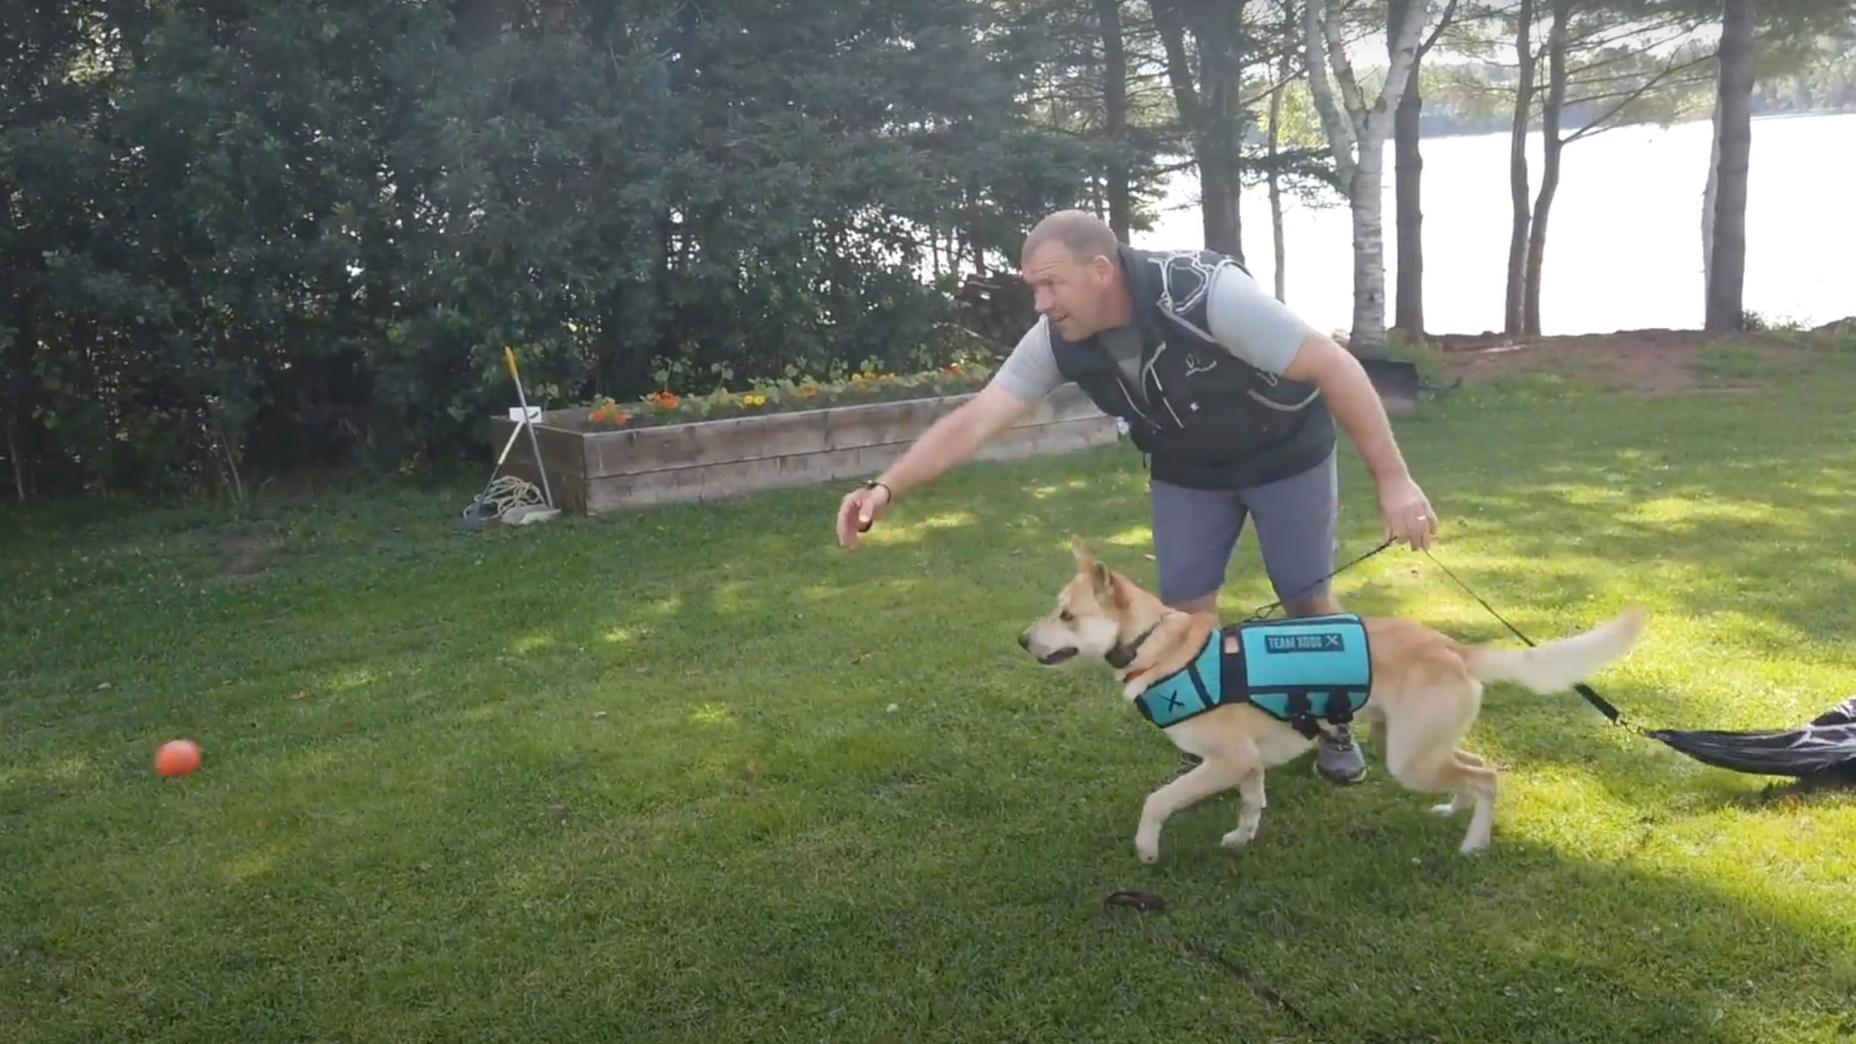 dog chasing ball in XDOG vest